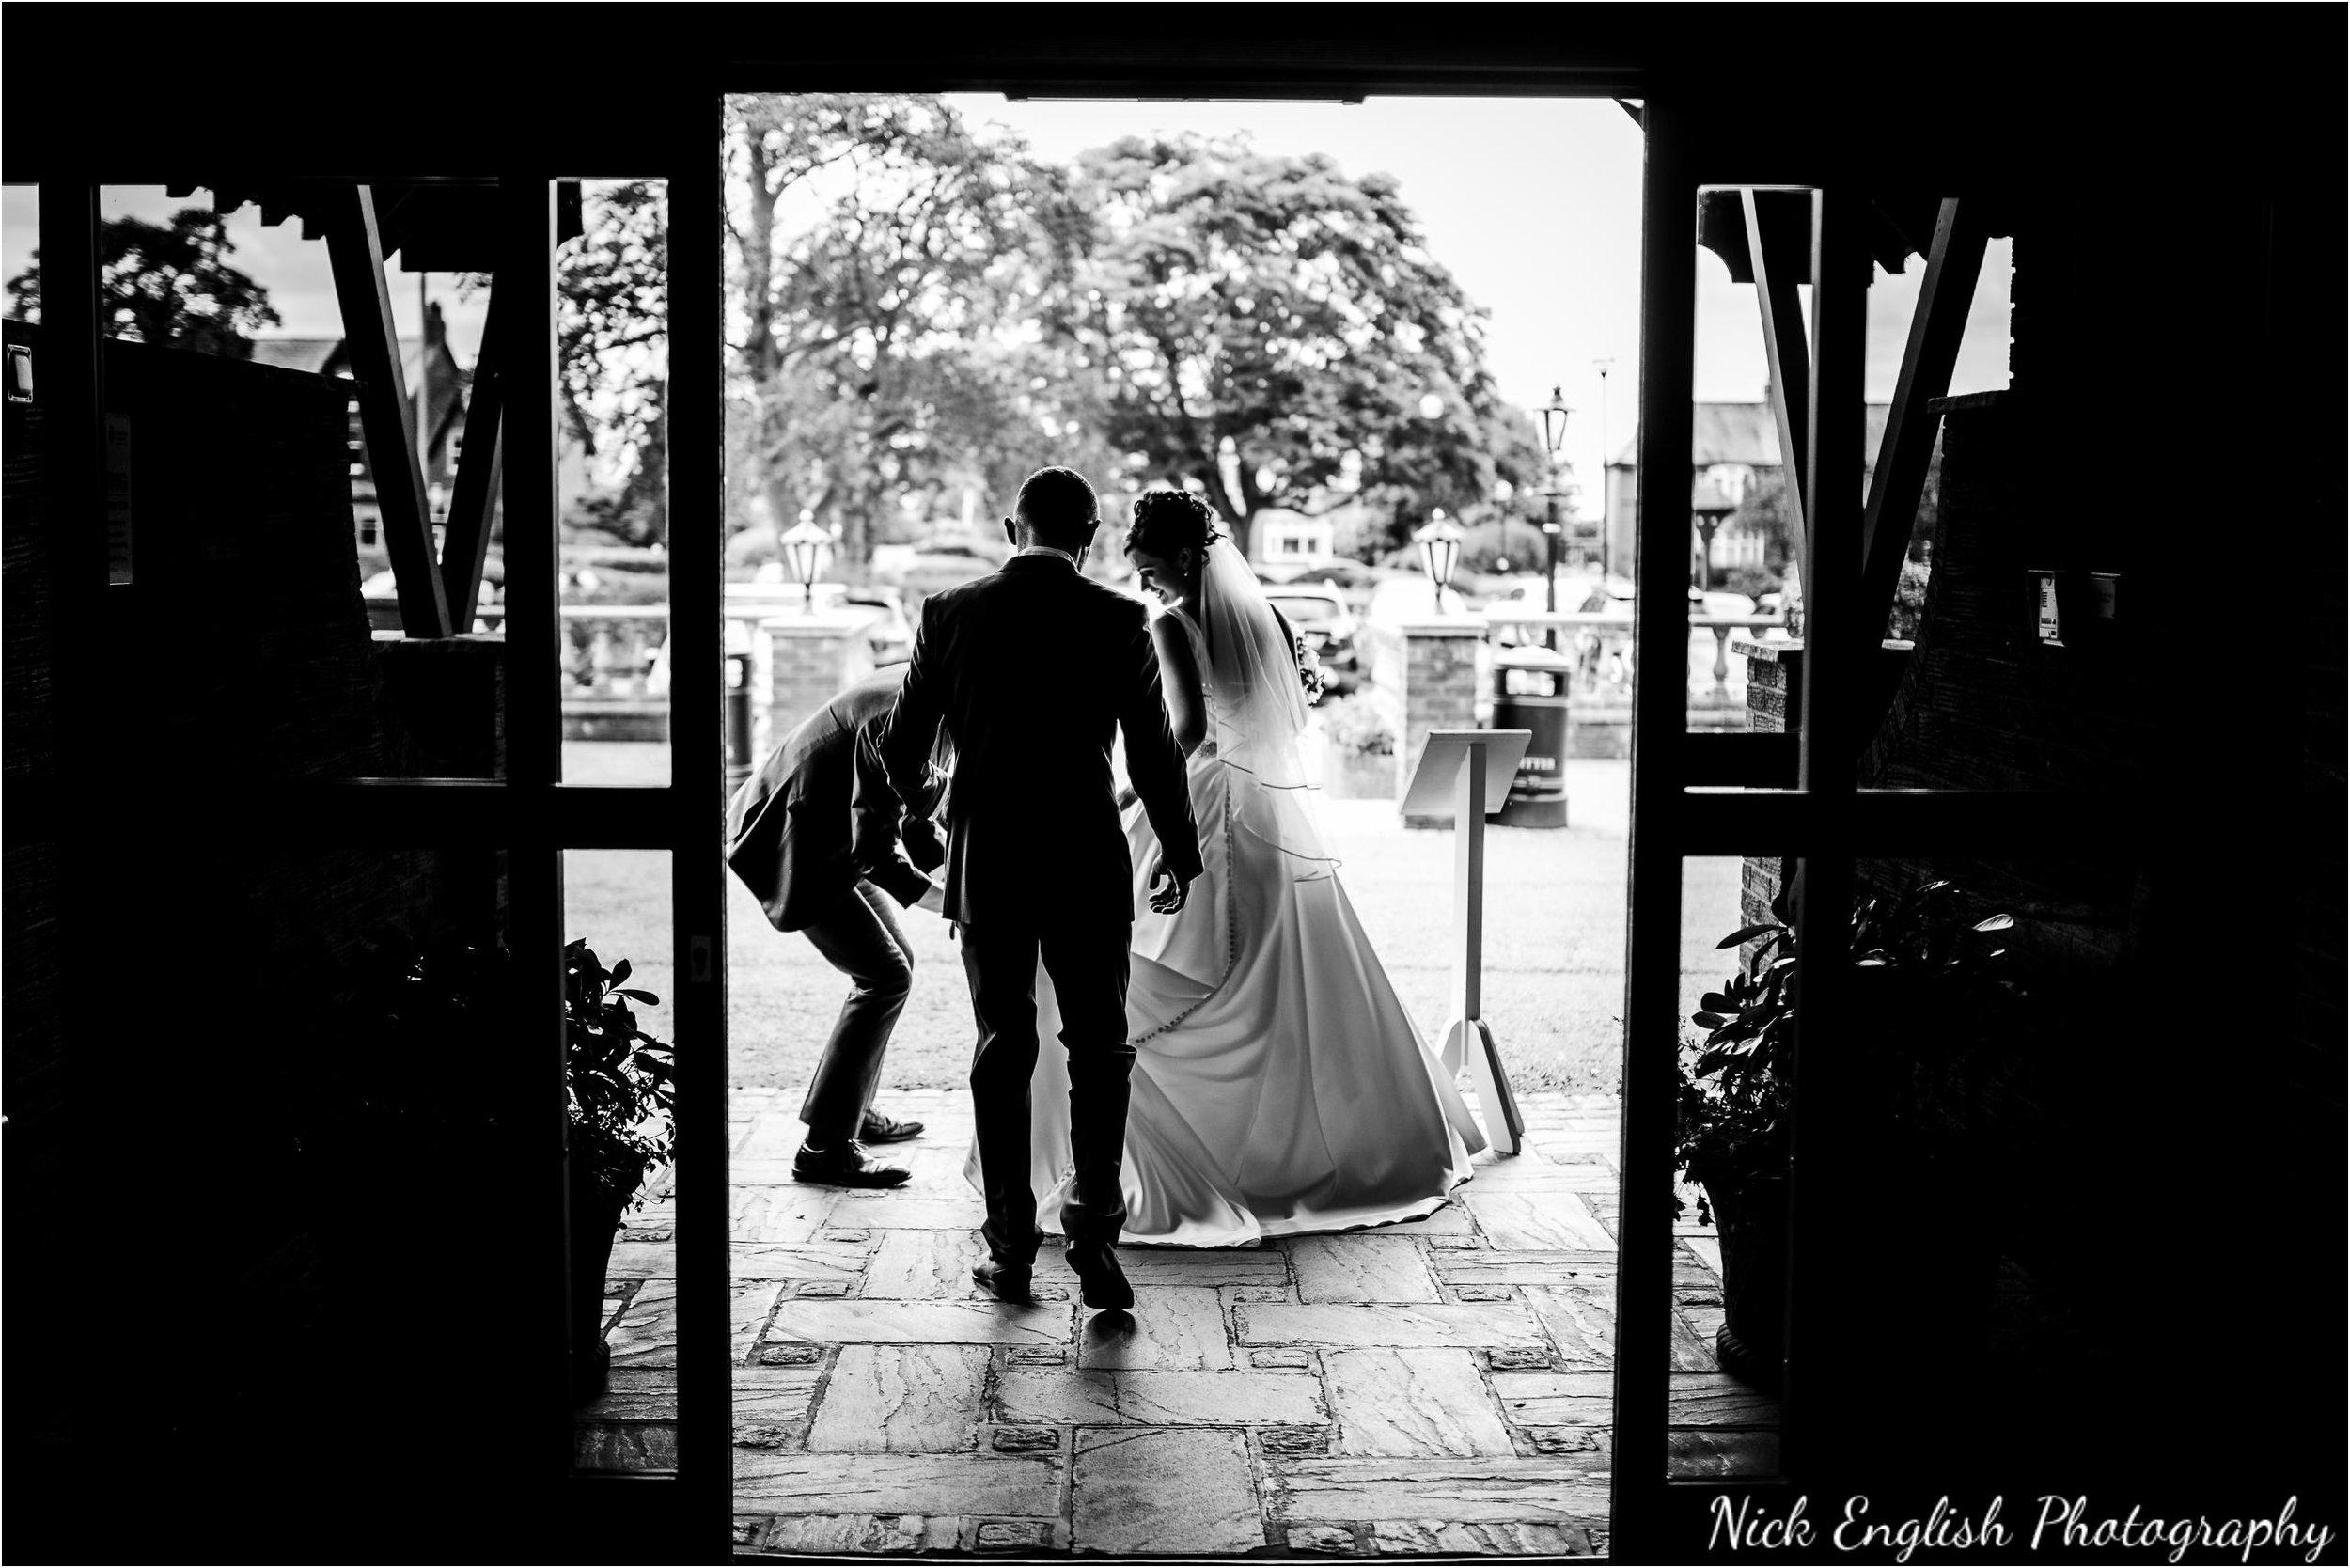 Emily David Wedding Photographs at Barton Grange Preston by Nick English Photography 84jpg.jpeg